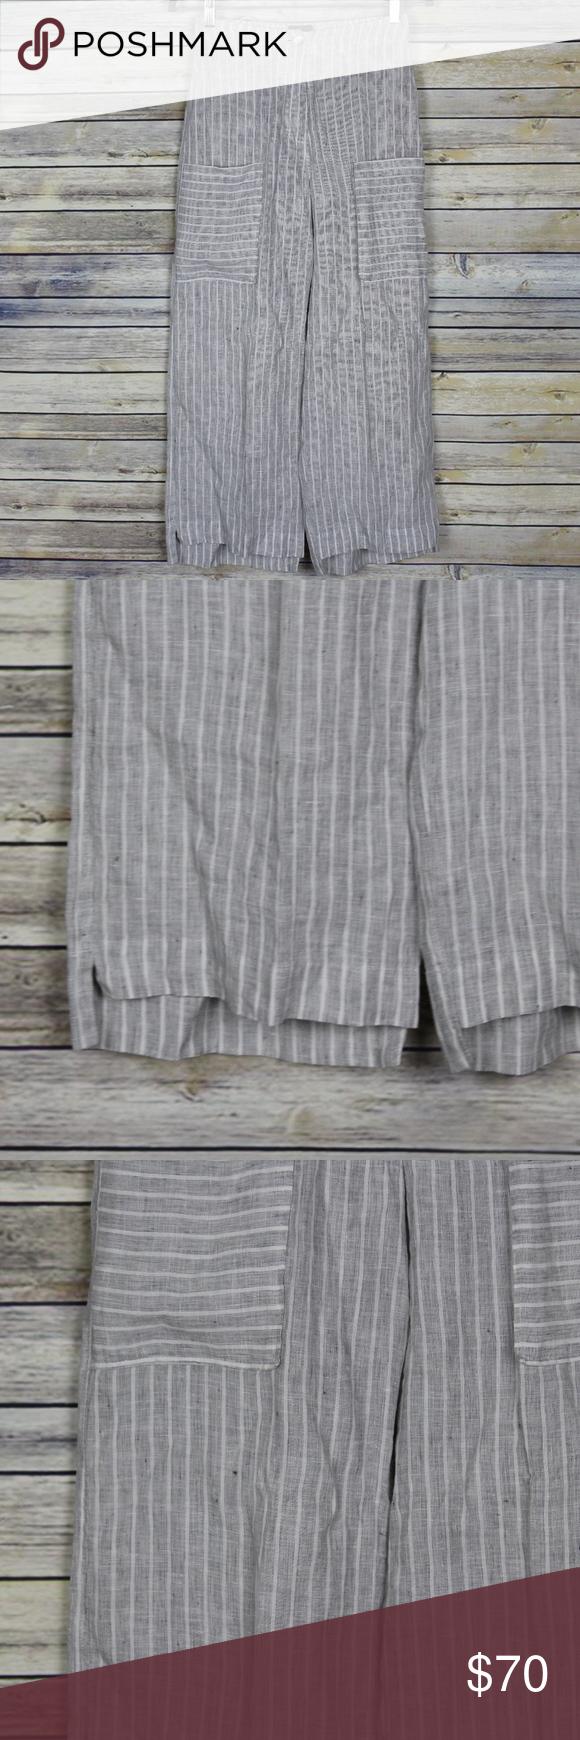 Oska Gytha Wash Cropped Linen Step Hem Trousers 0 Oska Lagenlook Gytha Wash 100 Linen Grey White Striped High Waist In 2020 Step Hem High Waisted Trouser Pants Oska